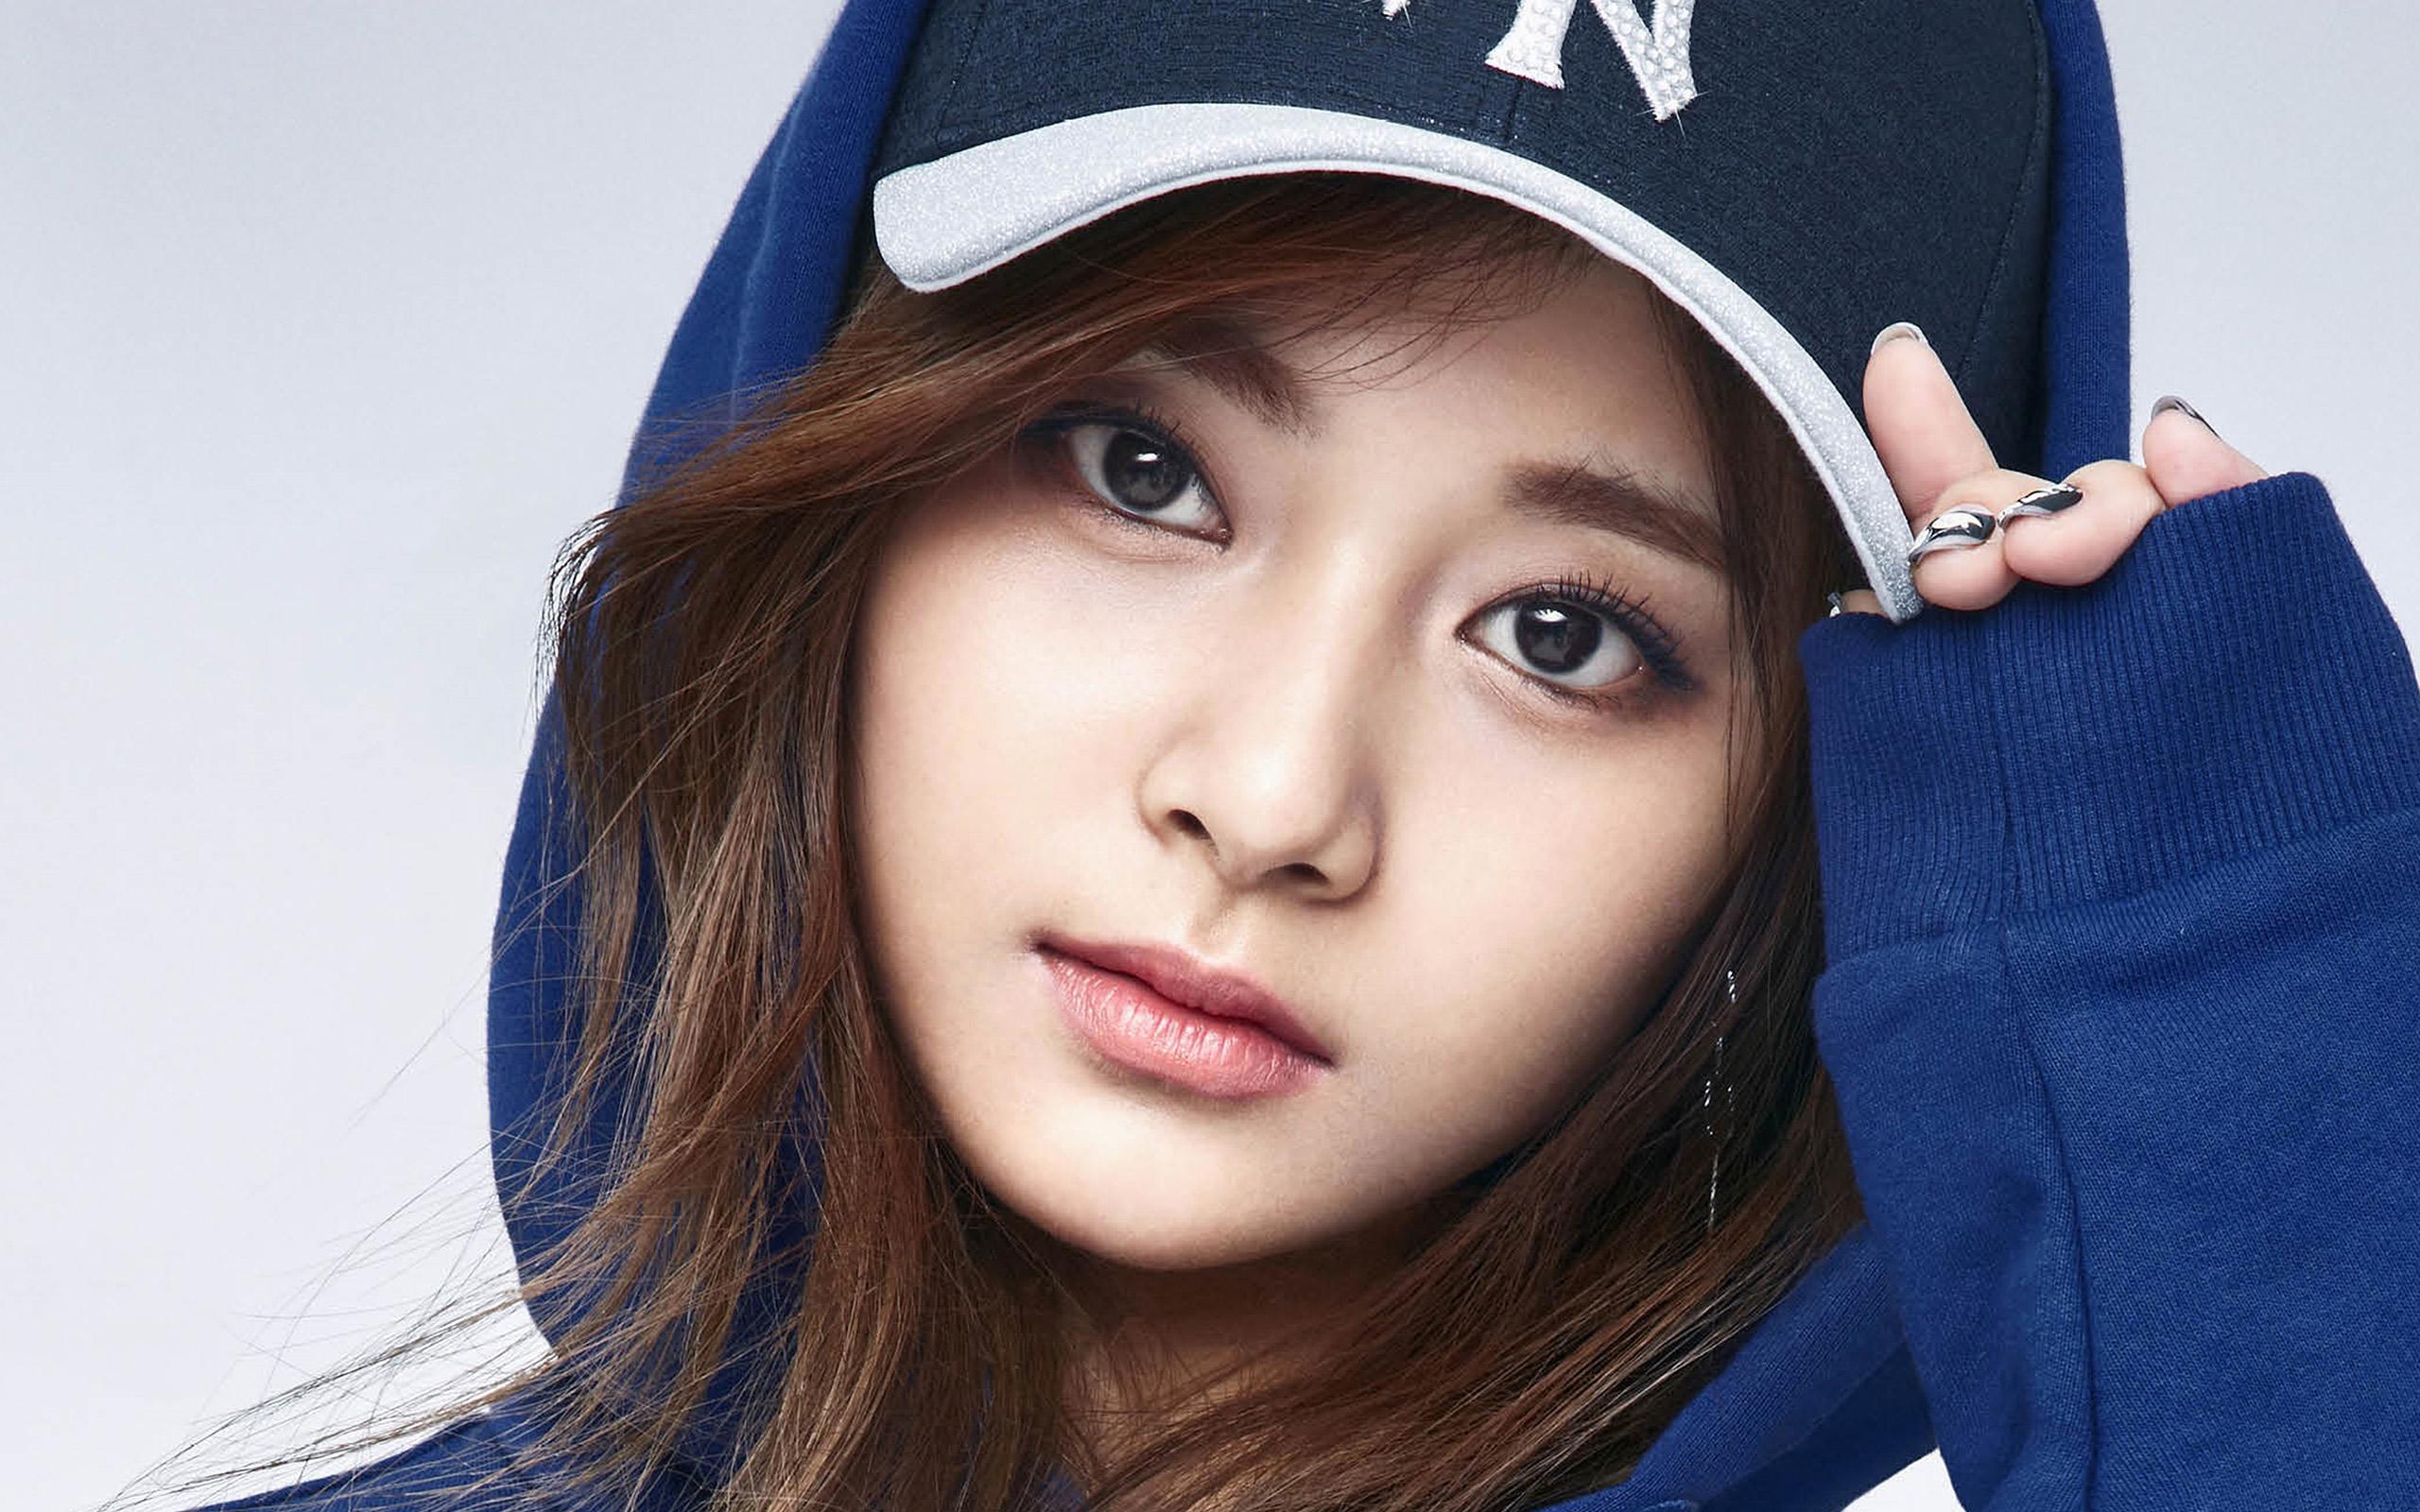 Android World Beautiful Girl Wallpapers Wallpaper For Desktop Laptop Hm79 Tzuyu Kpop Girl Idol Face